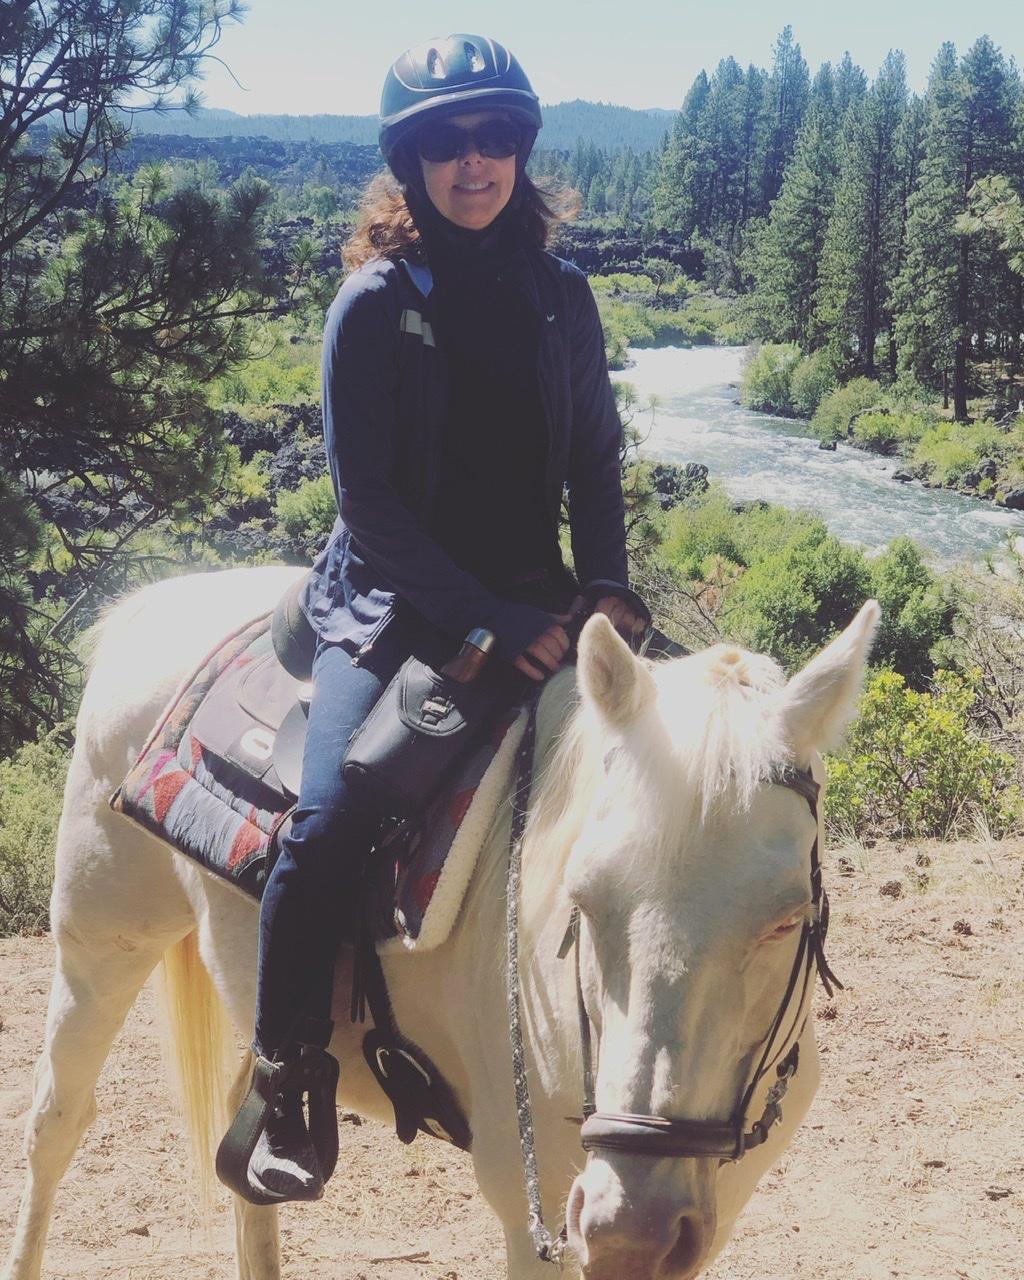 Horseback riding in Bend